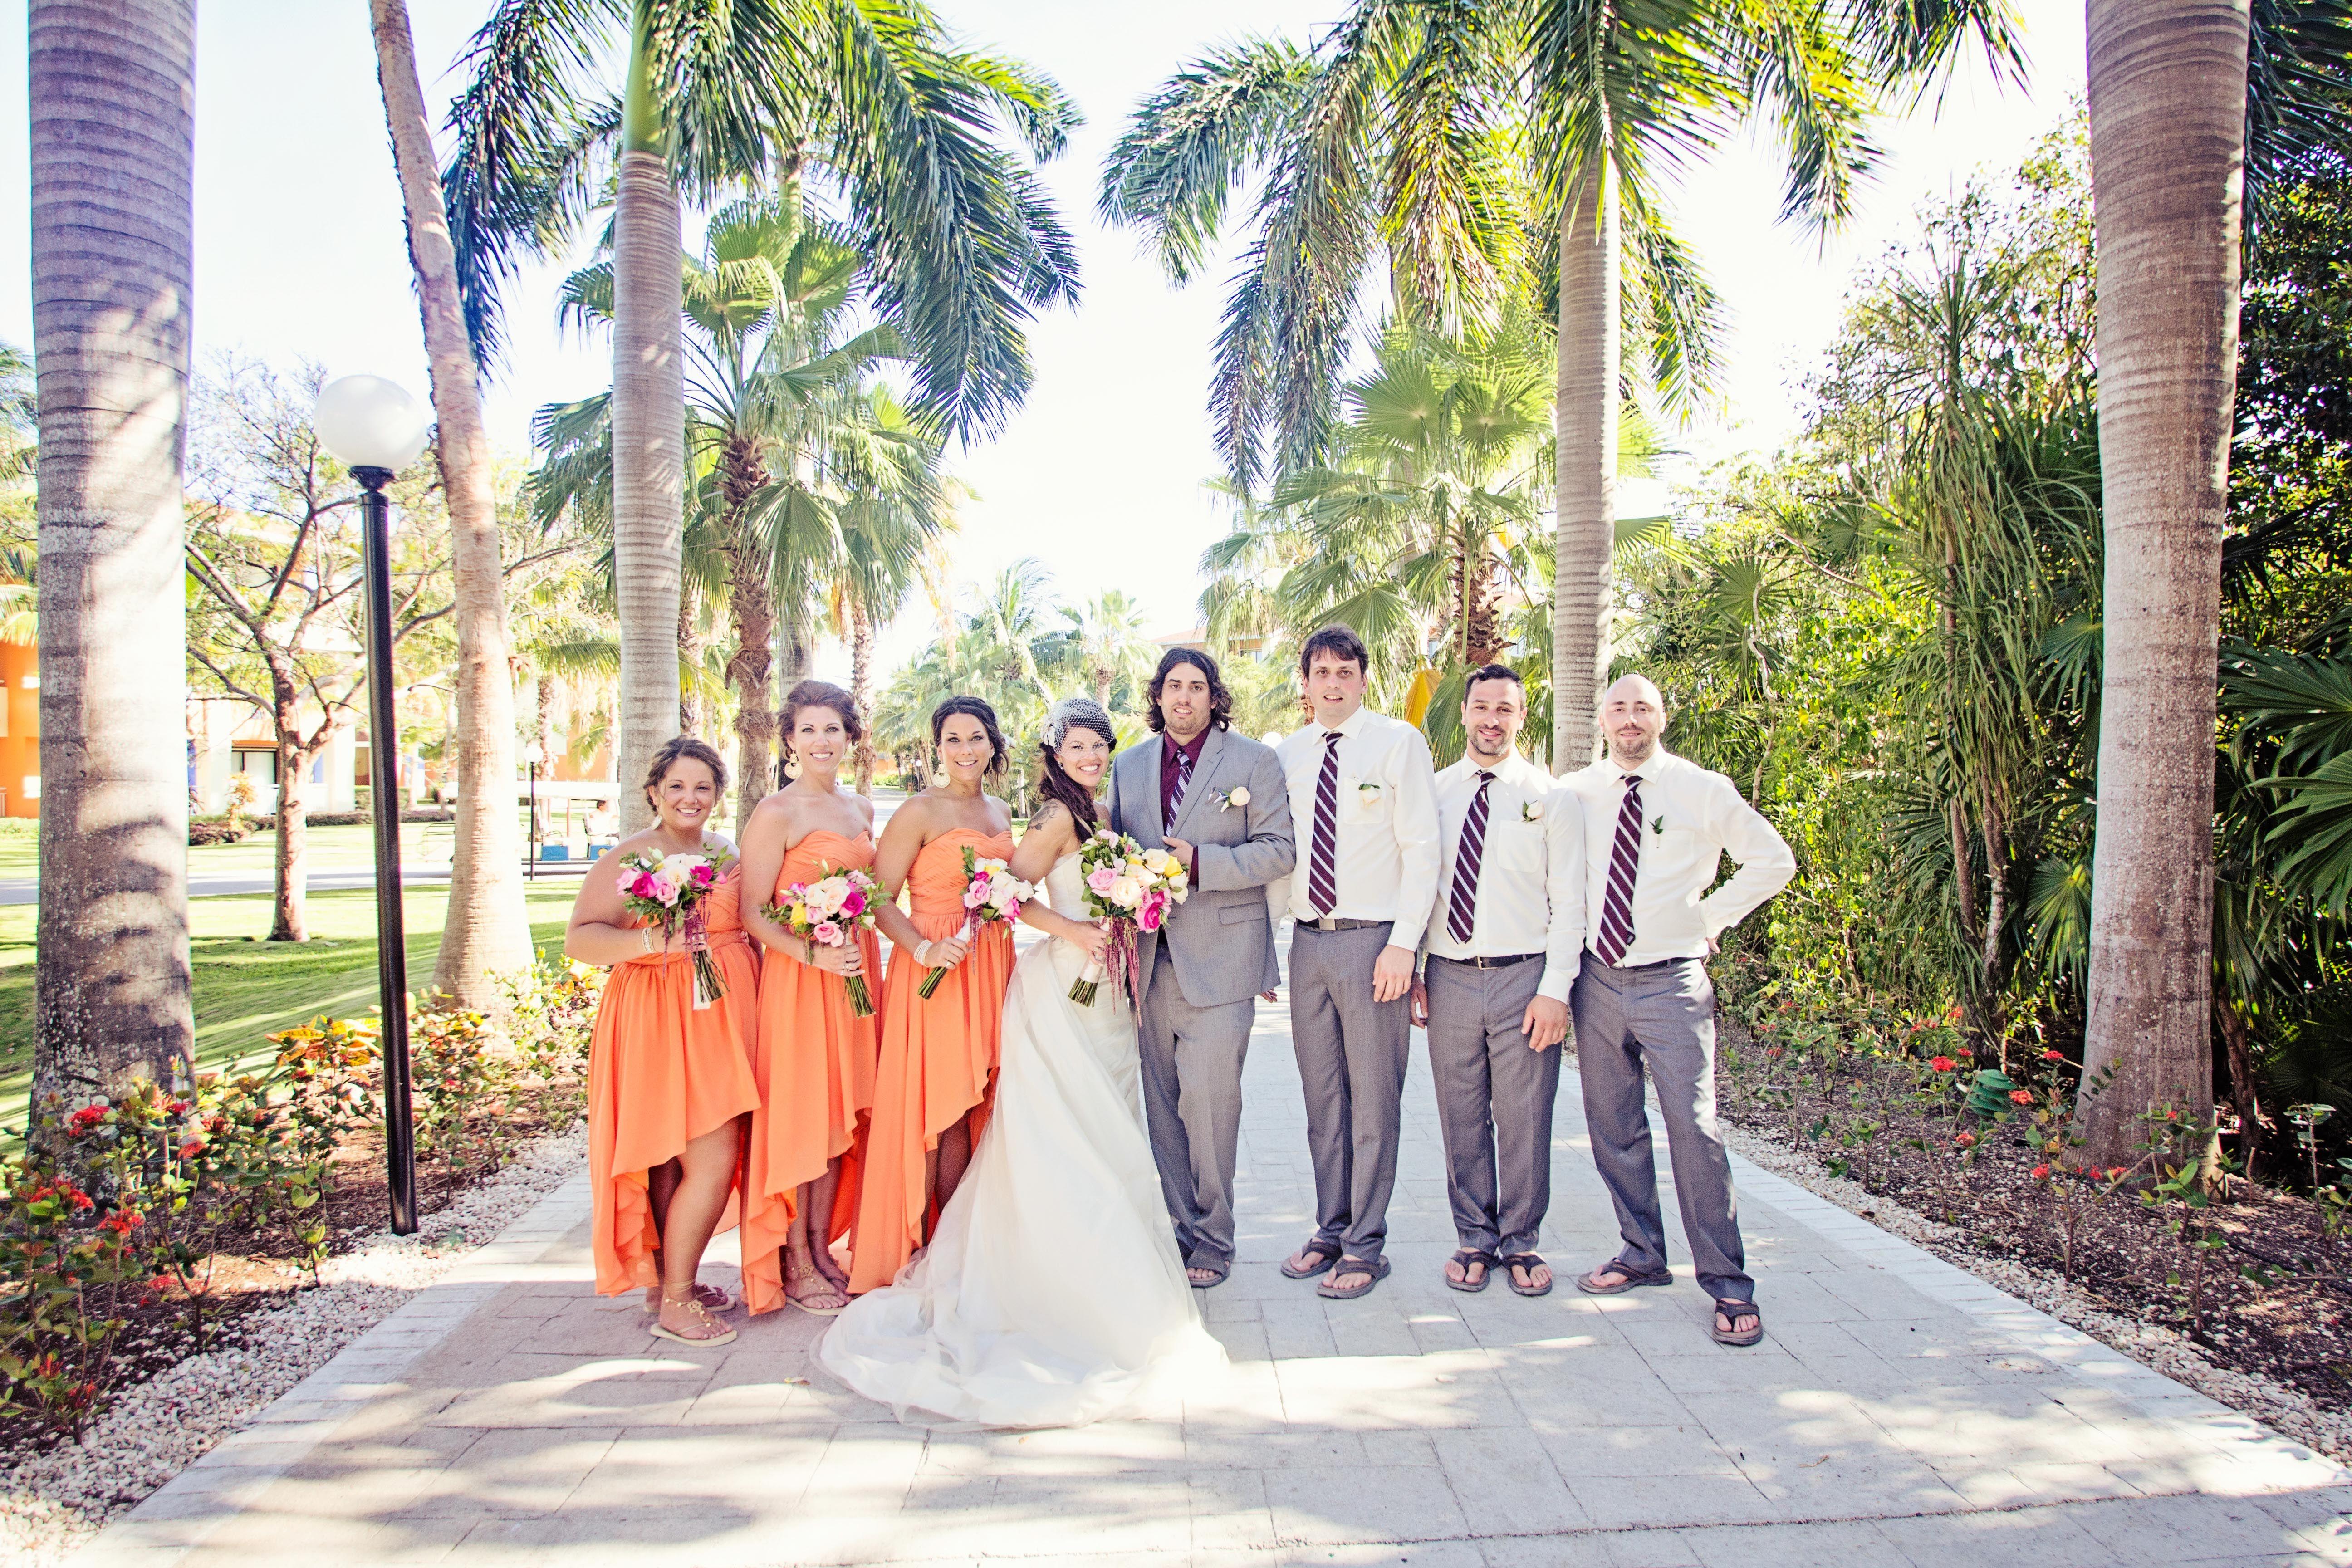 #Weddingphotography, #bride, #groom, #bridesmaids, #groomsmen, #resortwedding, #RivieraMaya, #Mexico, #Victoria, #BC #BCphotographer, #KaraPhotography